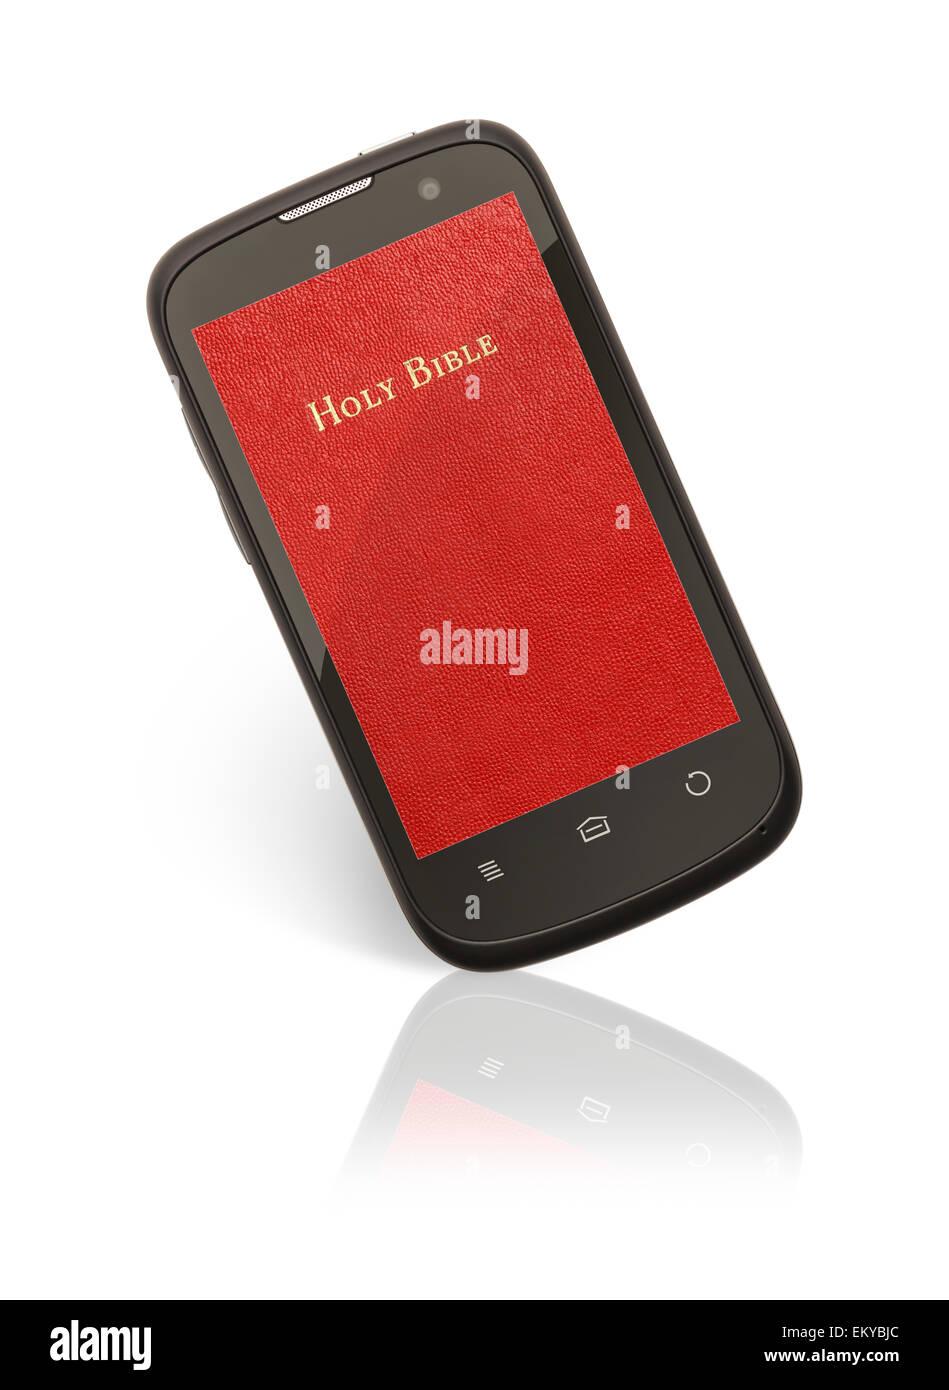 Rojo Santa Biblia App del teléfono inteligente aislado sobre fondo blanco. Imagen De Stock